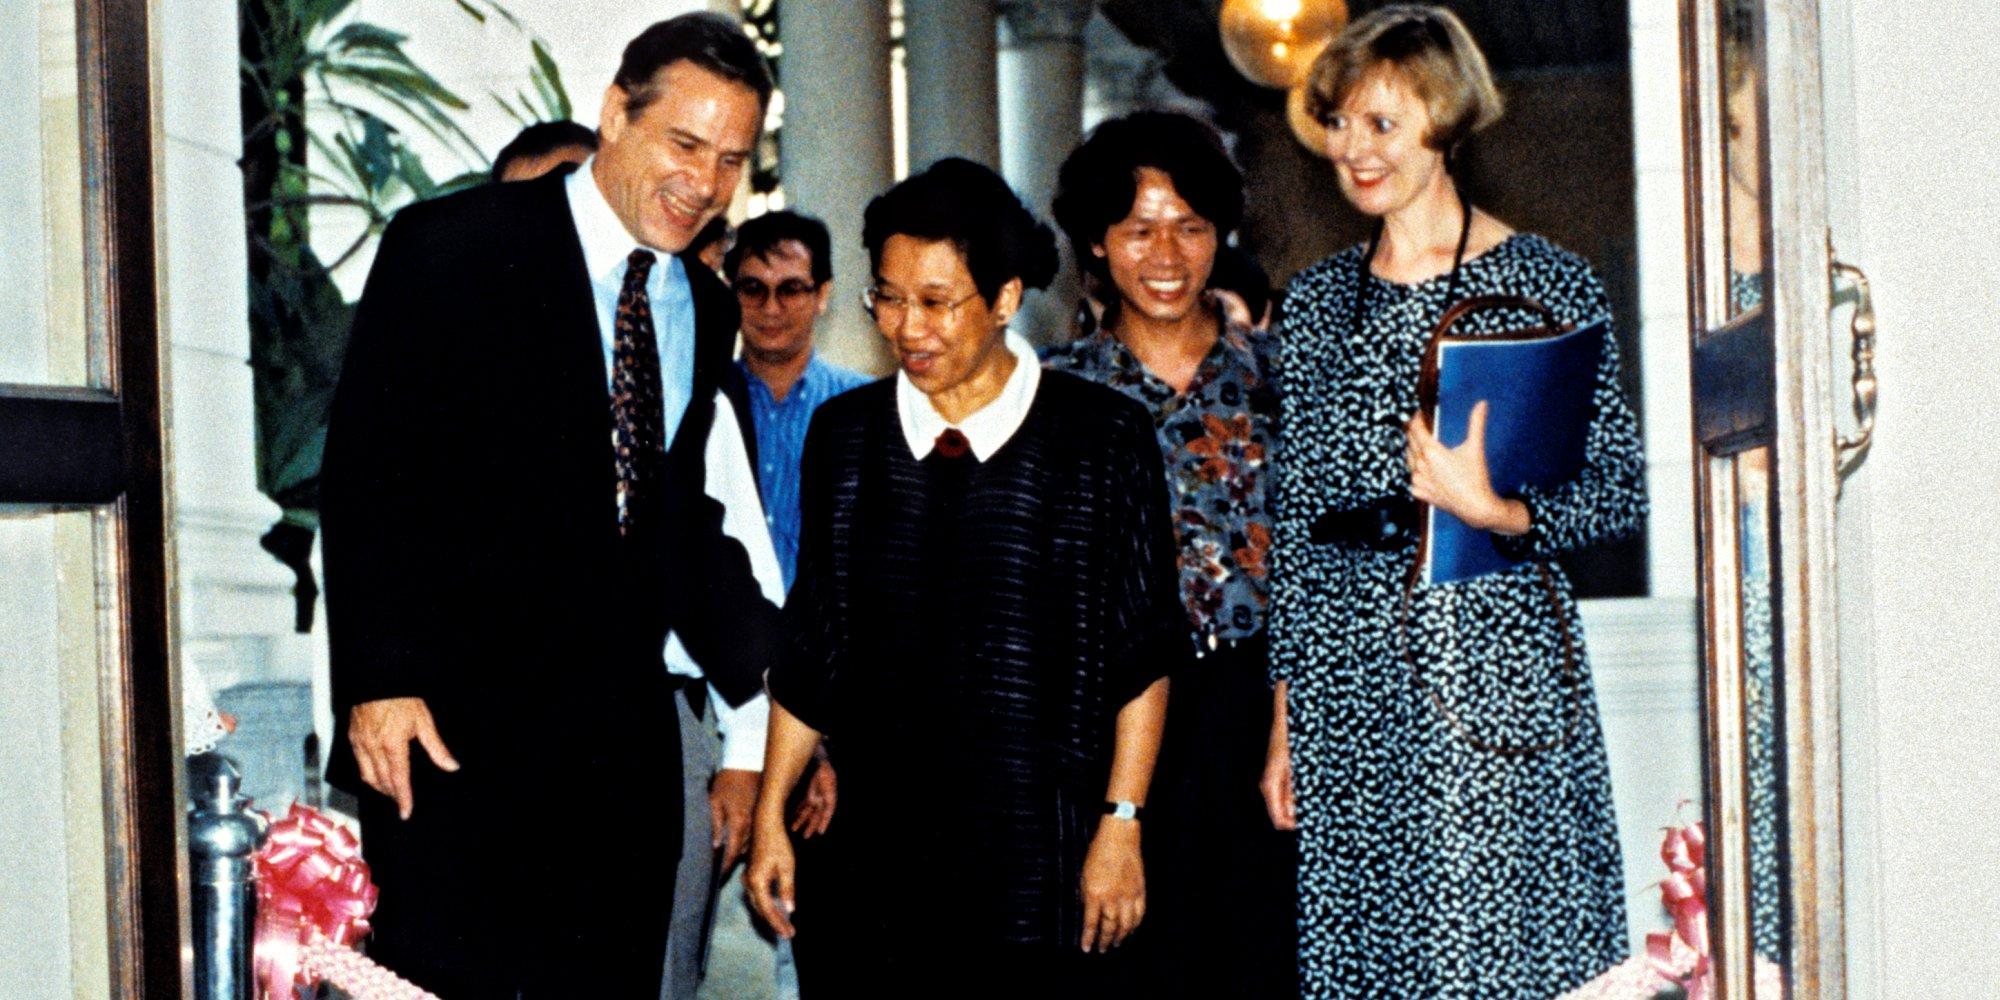 Opening event: Silpakorn University (Australian Ambassador John McCarthy, Somporn Rodboon, Anne Kirker)